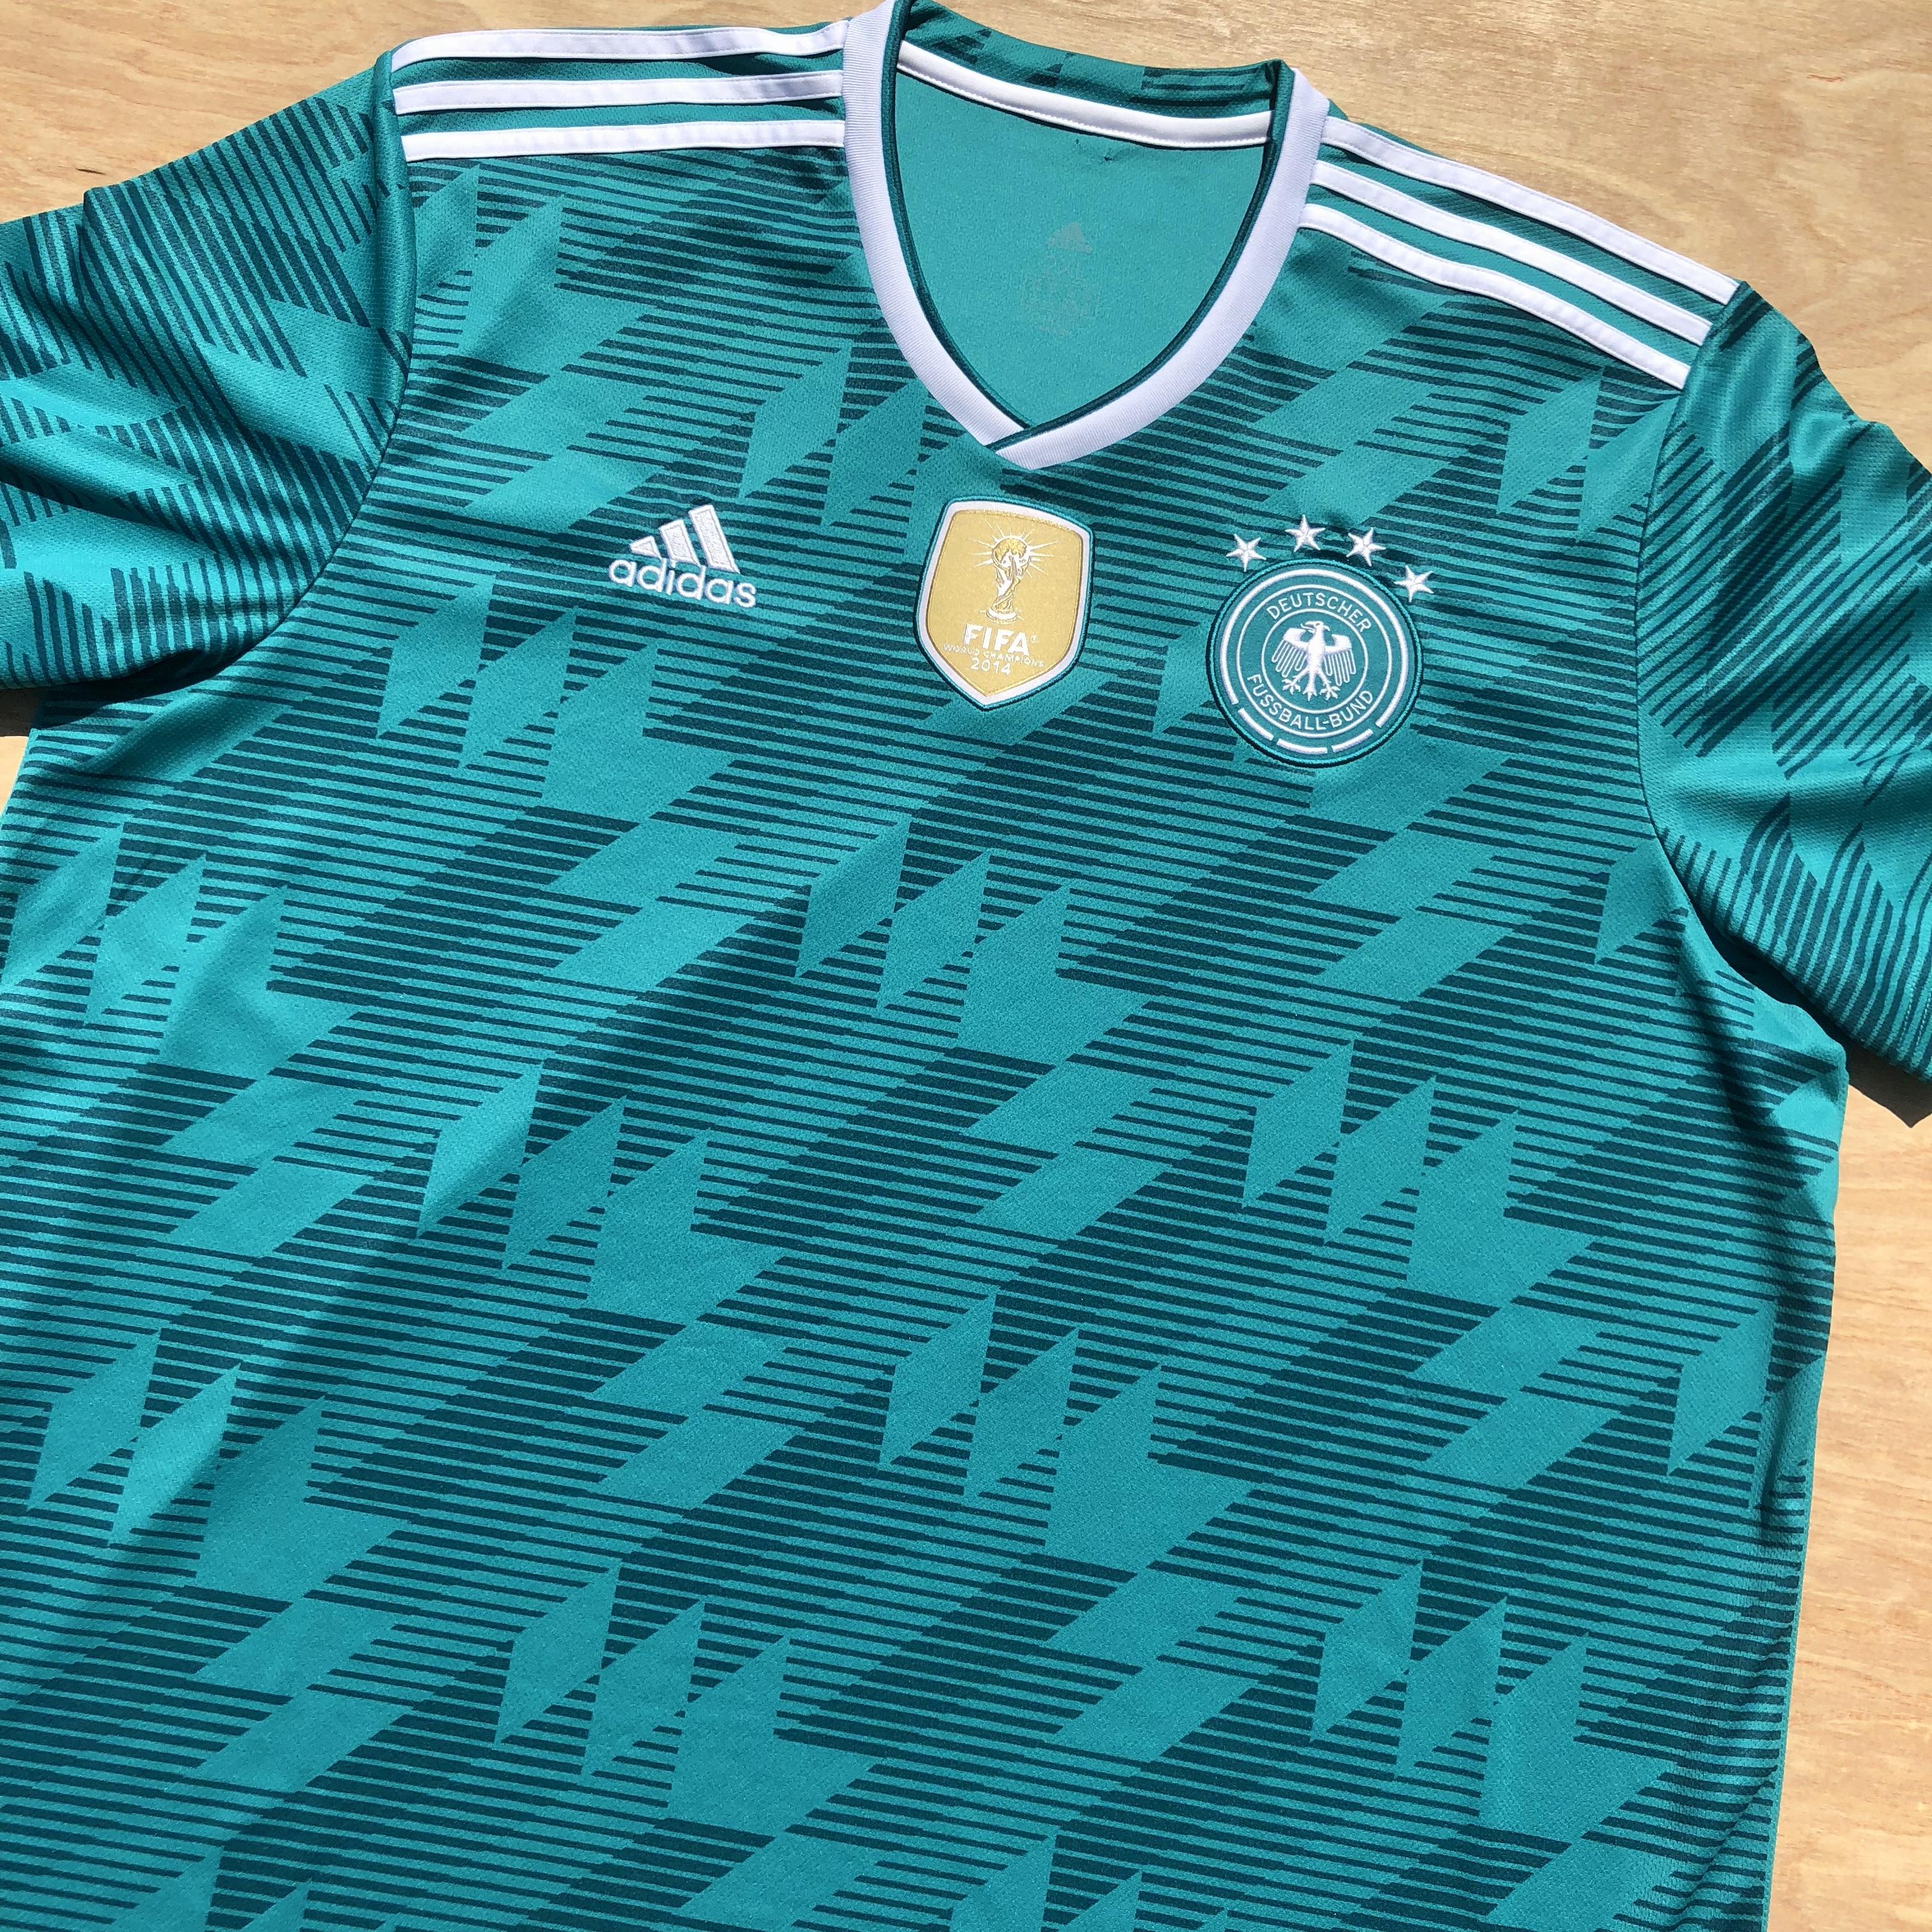 ce2ba1456e9 Adidas × Vintage ×. 2014 Adidas Germany Fifa World Cup Champion Soccer ...